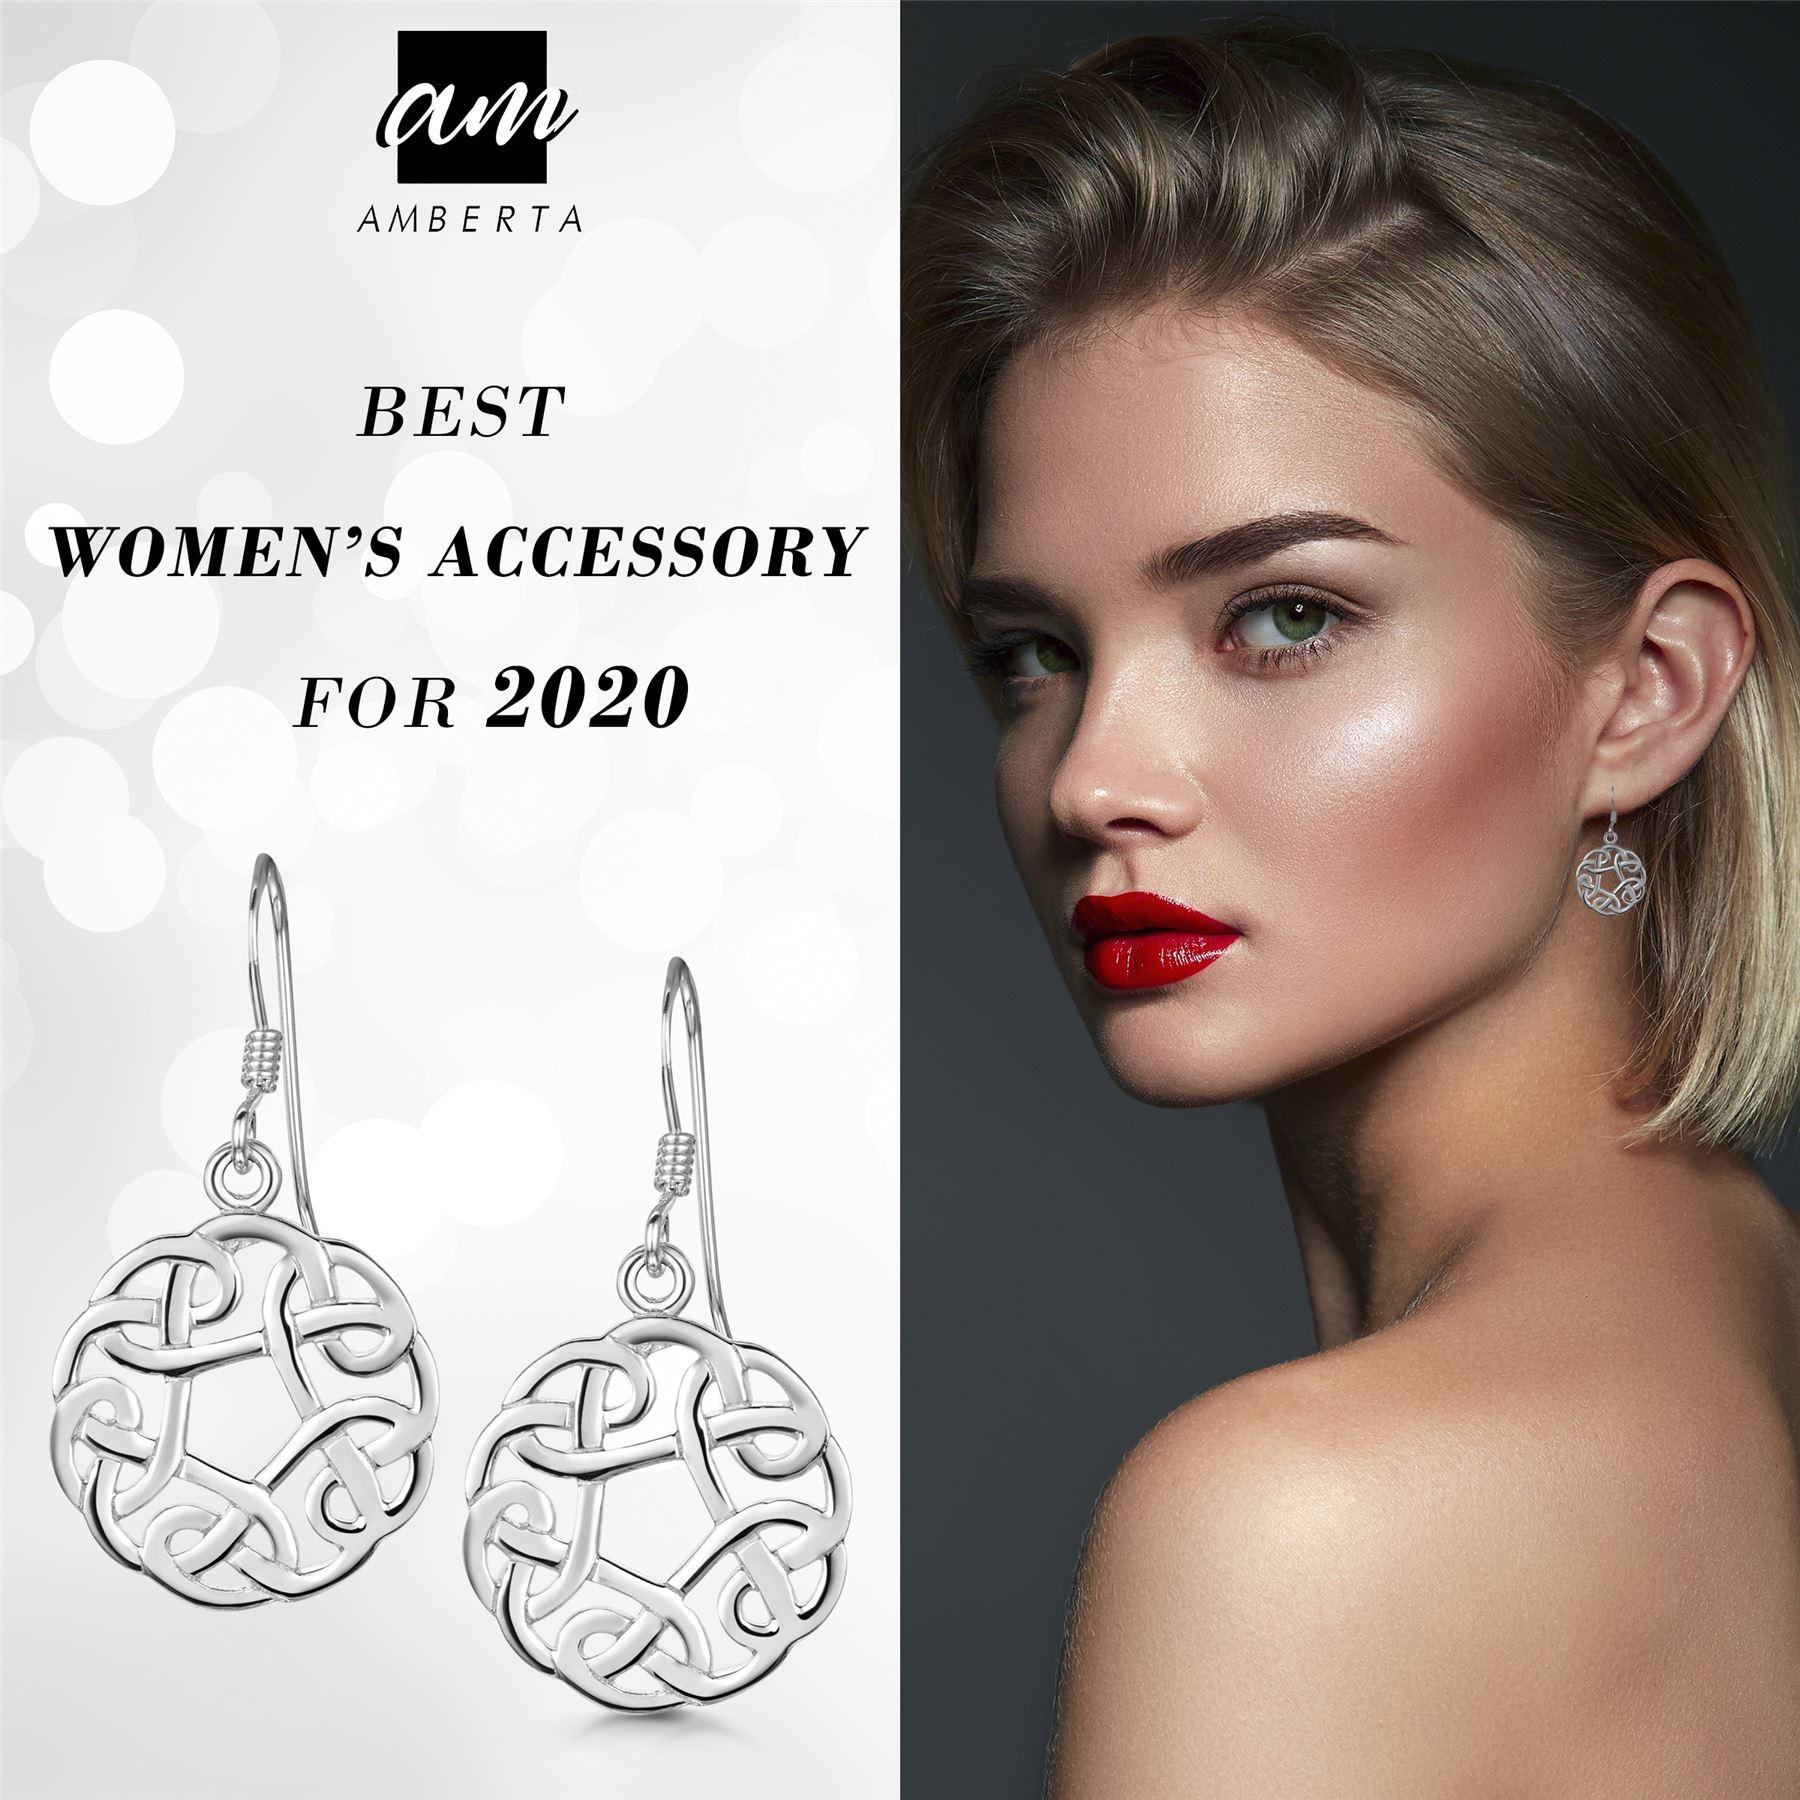 Amberta-925-Sterling-Silver-Celtic-Knot-Earrings-for-Women-Irish-Design miniature 24